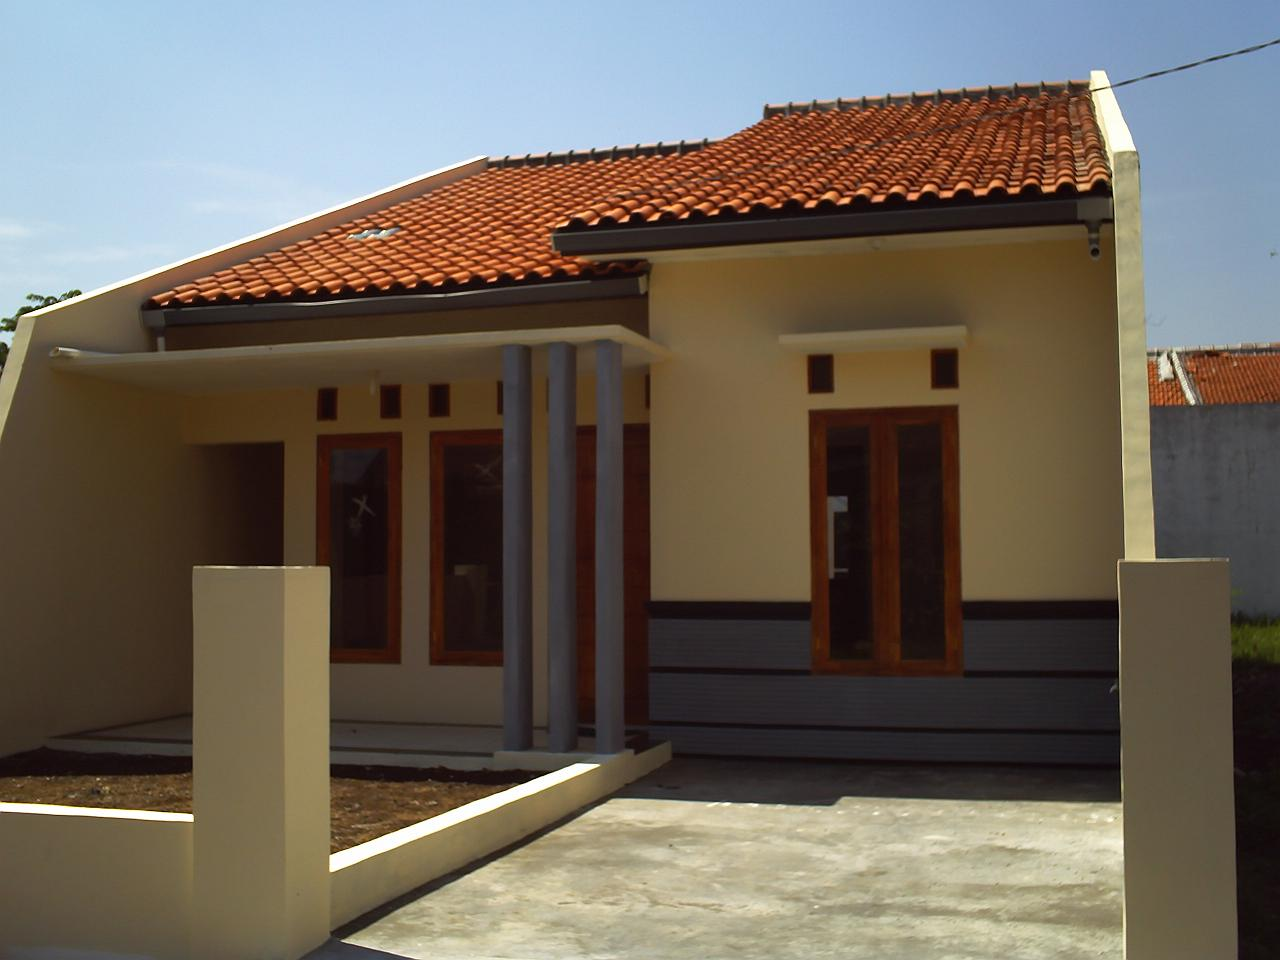 gambar rumah minimalis rumah minimalis rumah minimalis rumah minimalis